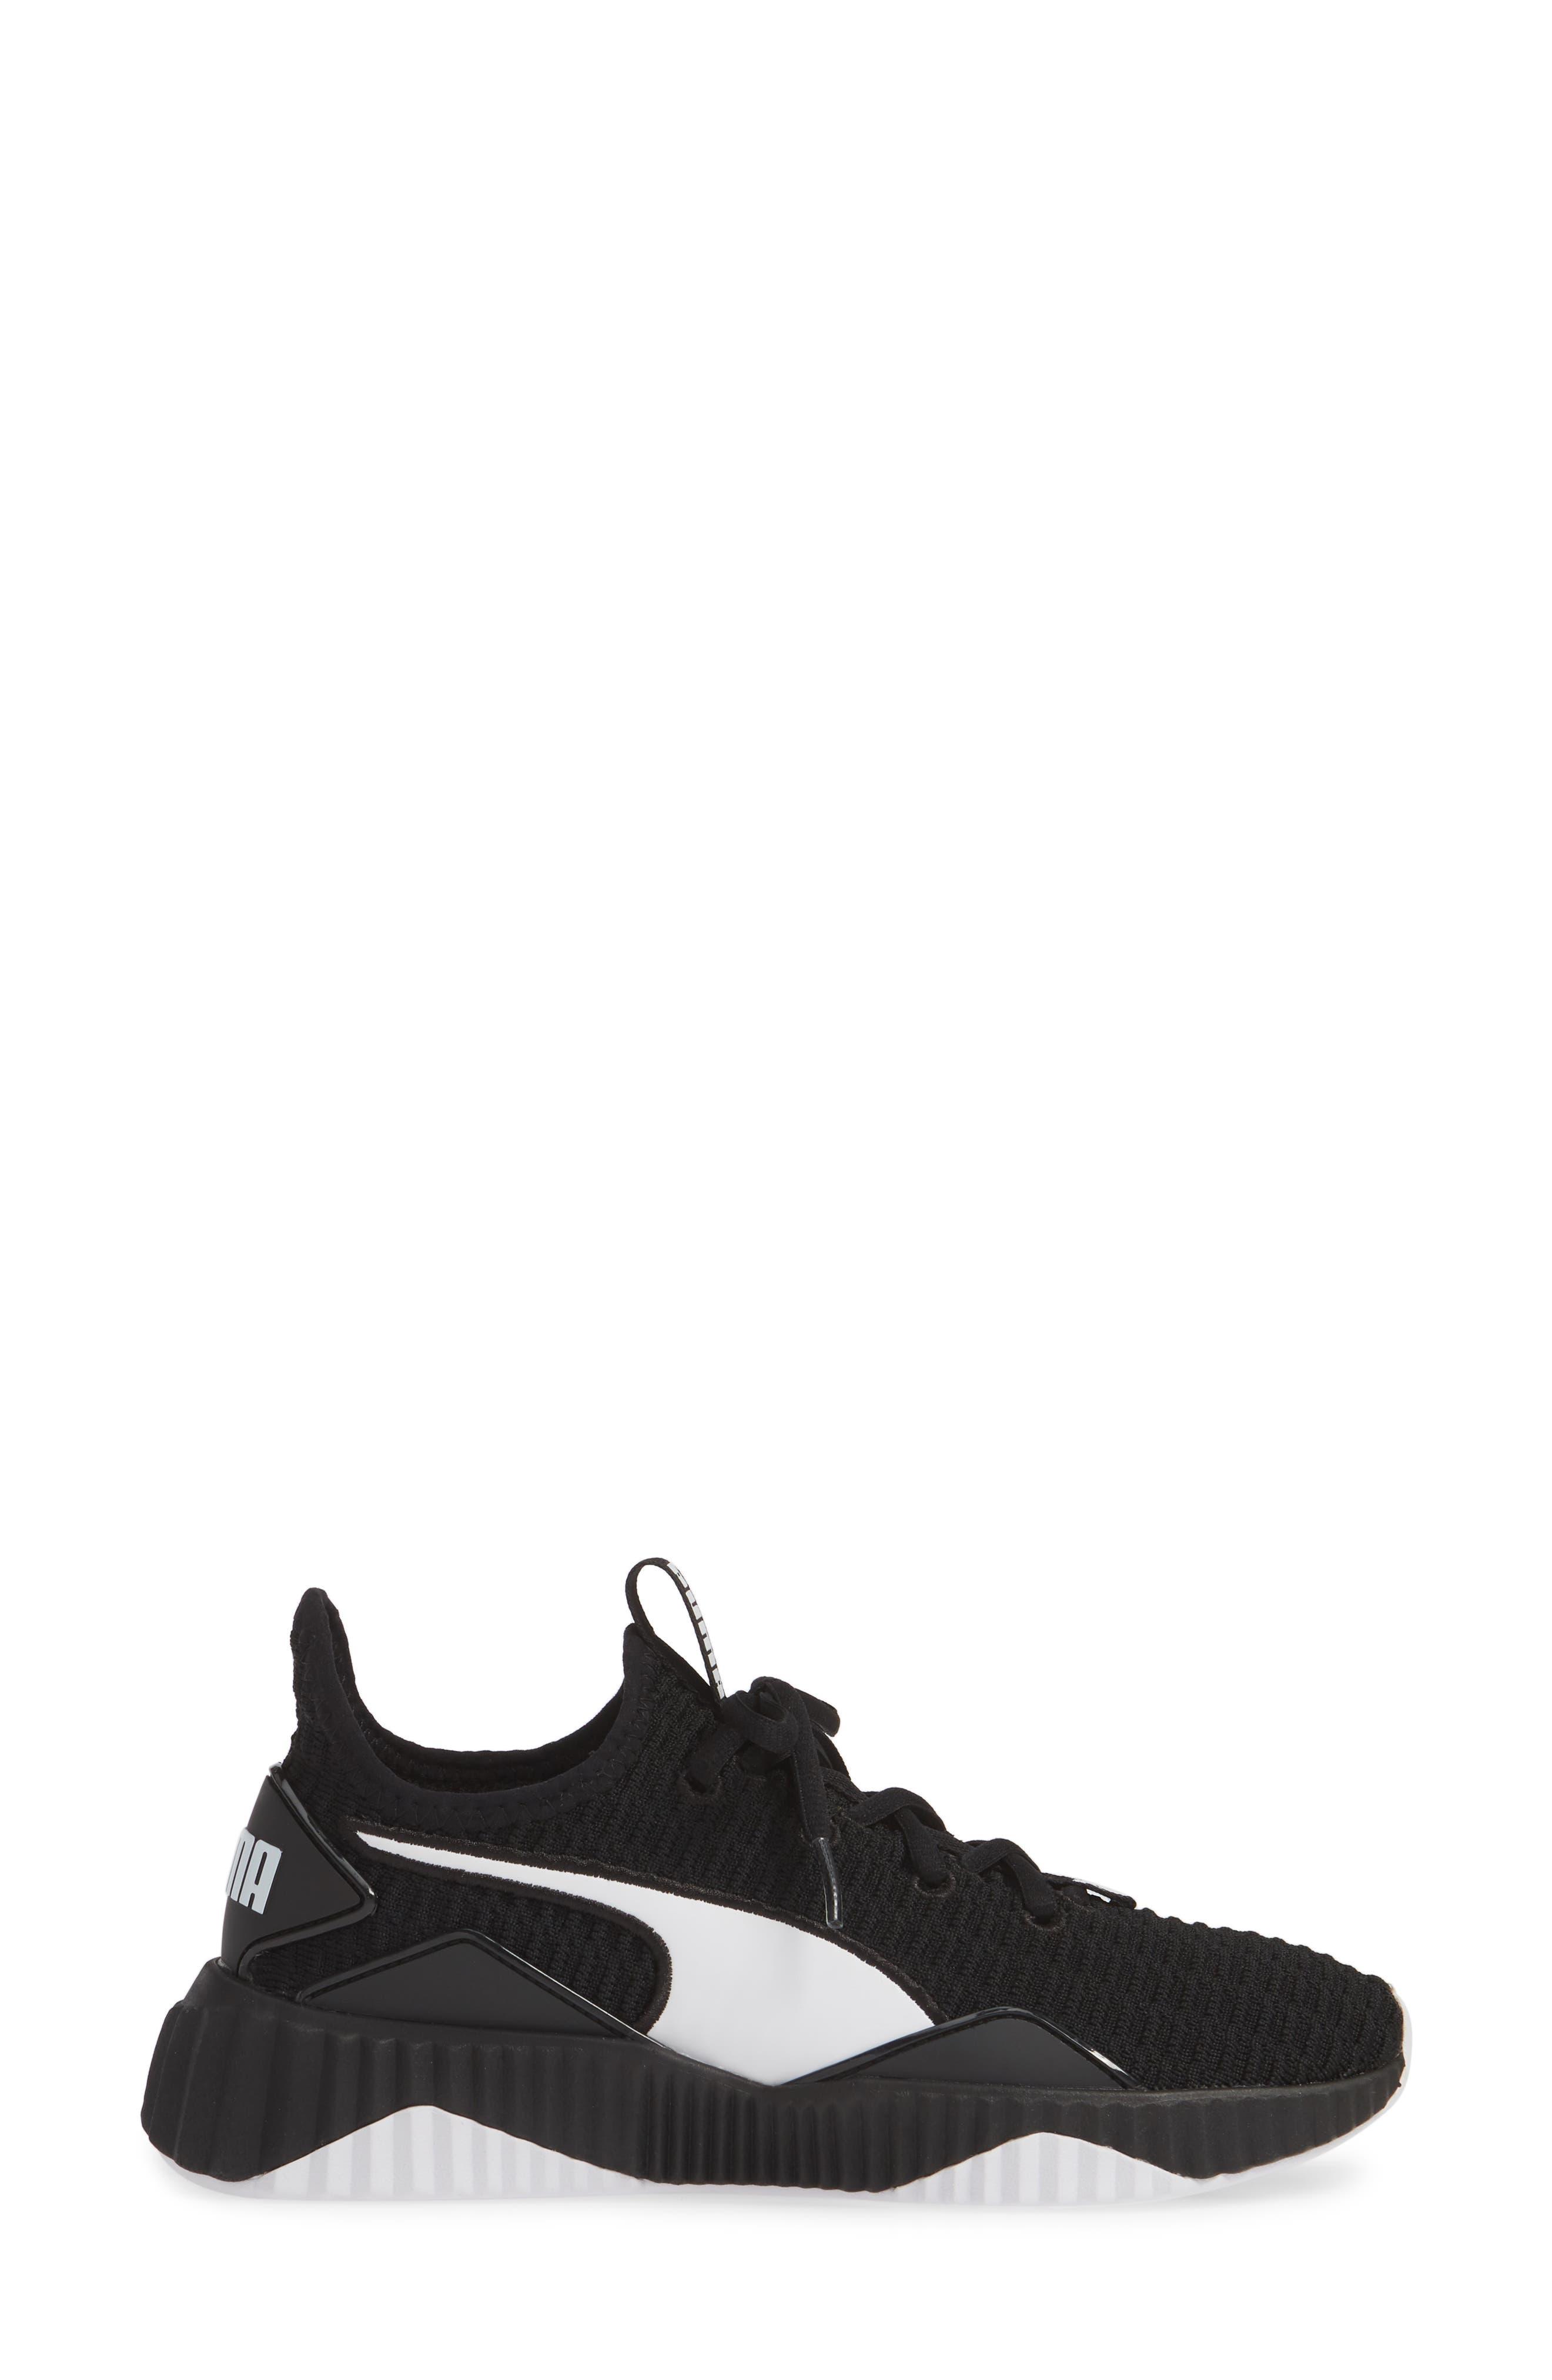 PUMA, Defy Sneaker, Alternate thumbnail 3, color, BLACK/ WHITE